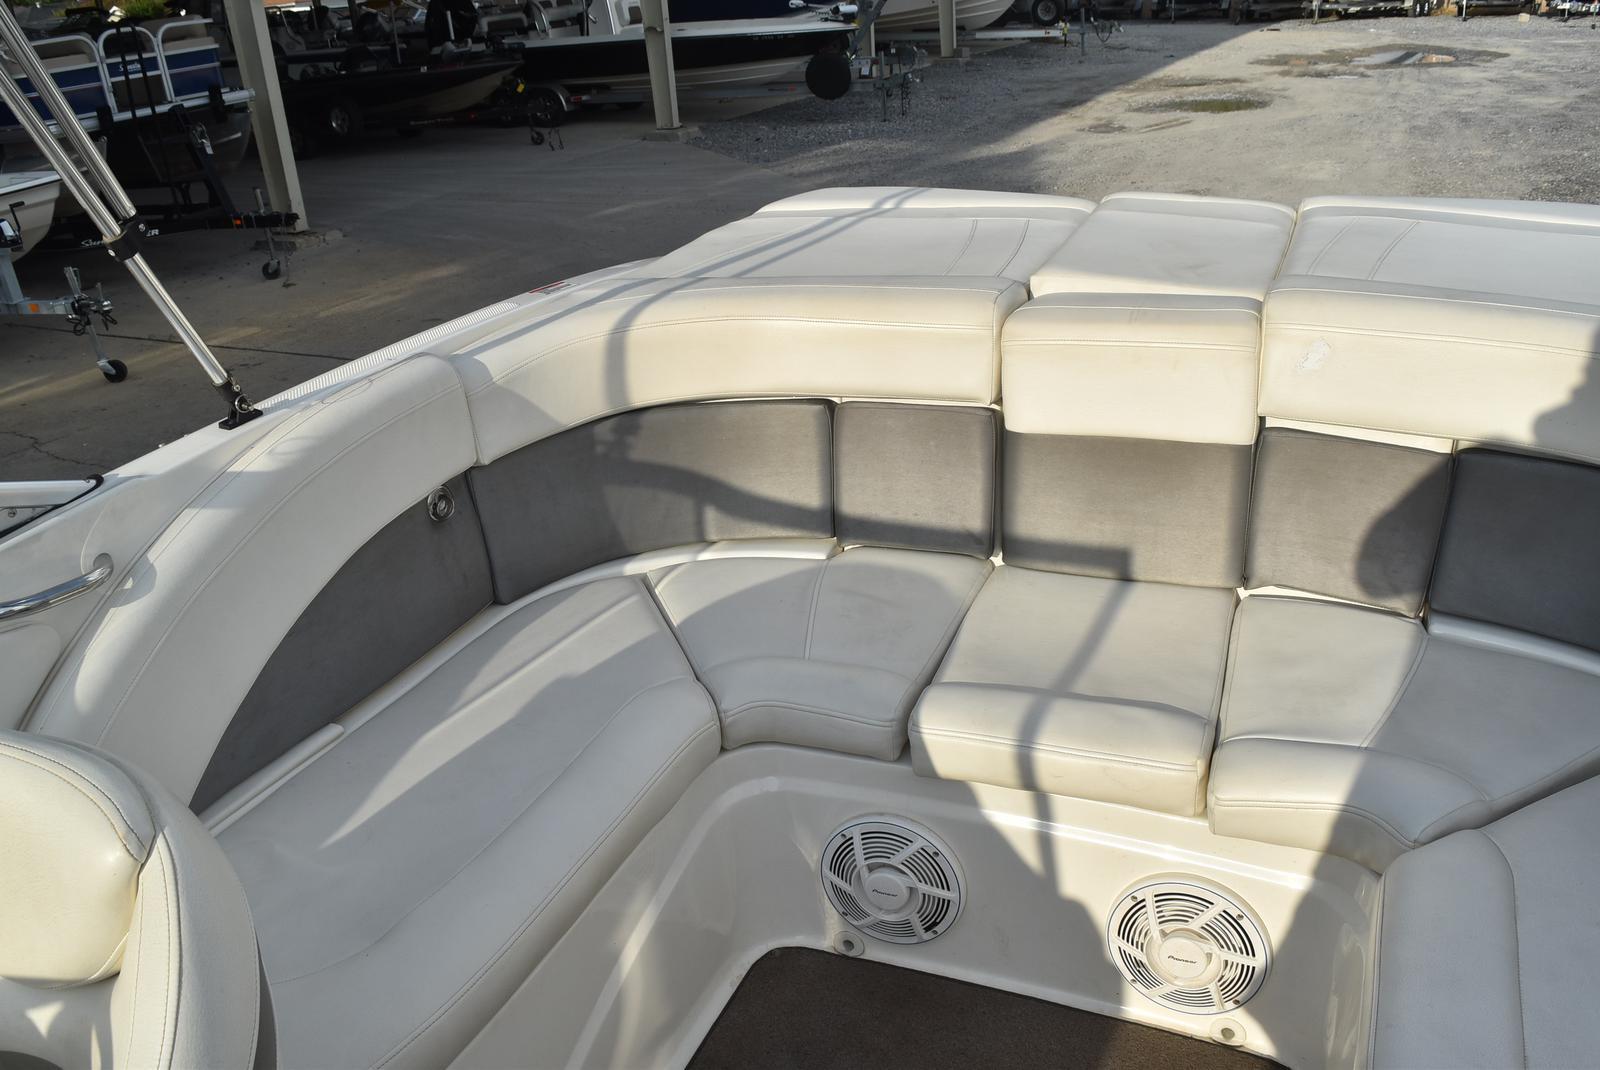 2010 Bayliner boat for sale, model of the boat is 235BR & Image # 2 of 43